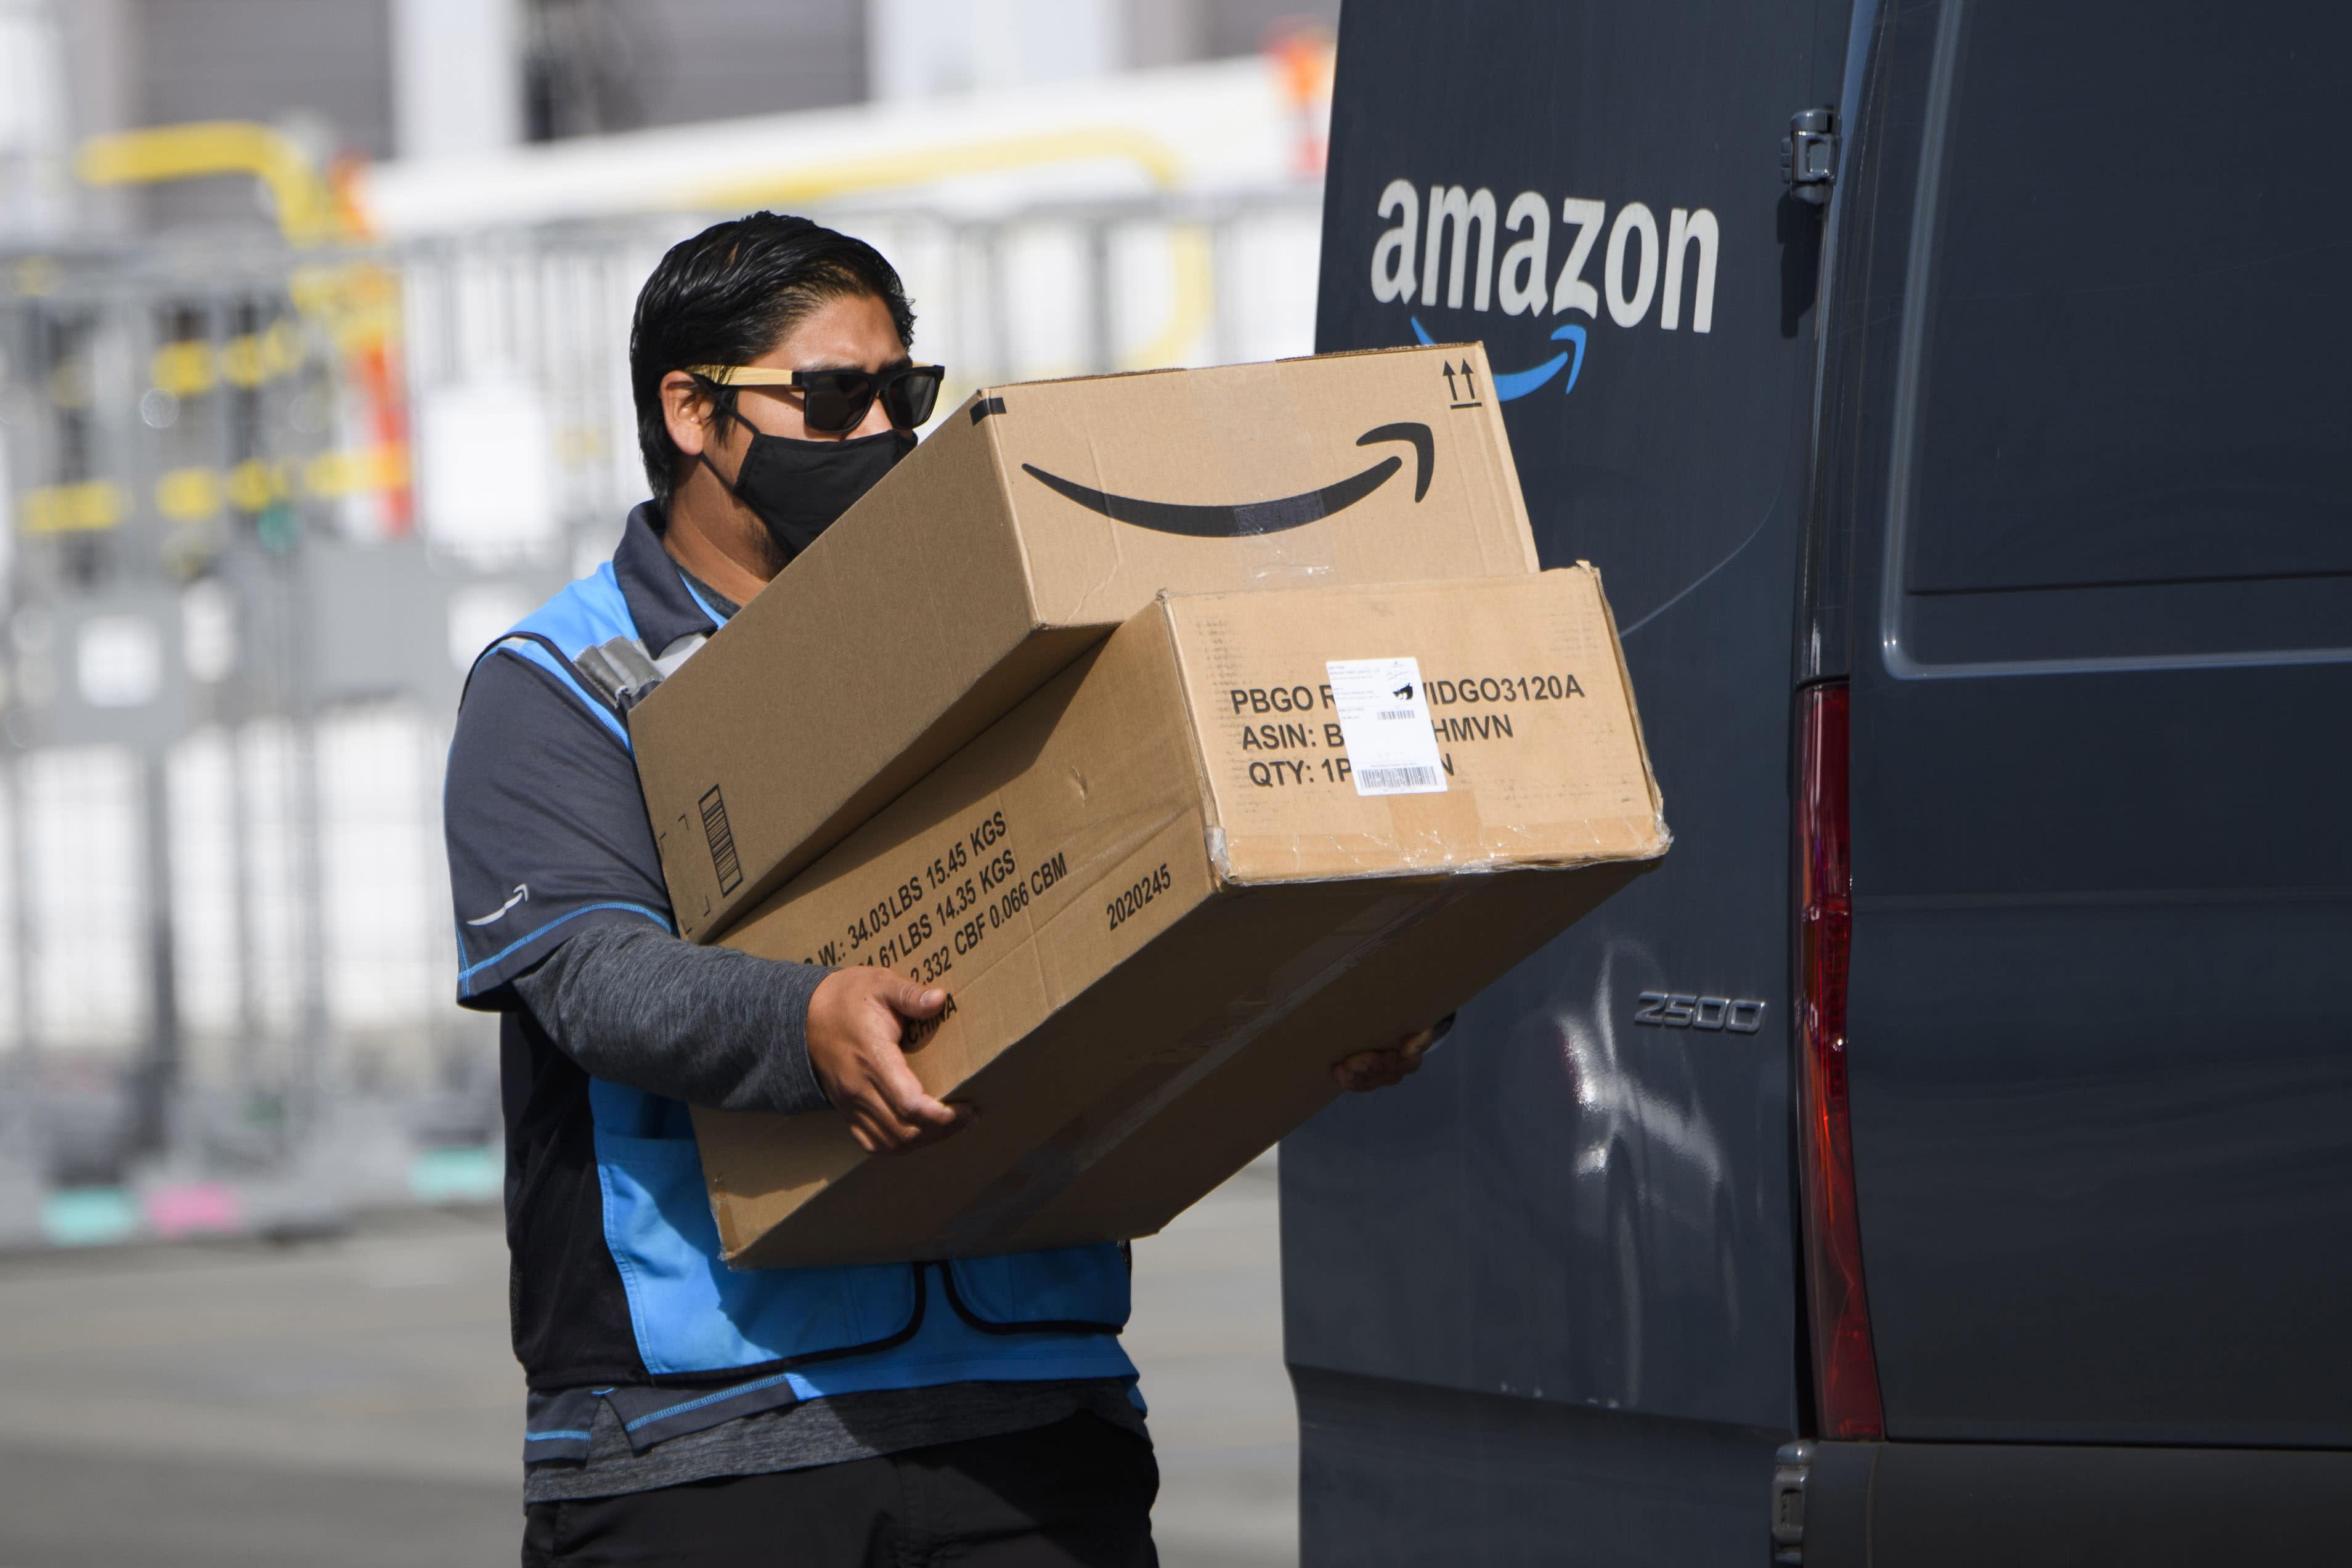 Amazon's top third-party seller in US plans to go public via SPAC thumbnail